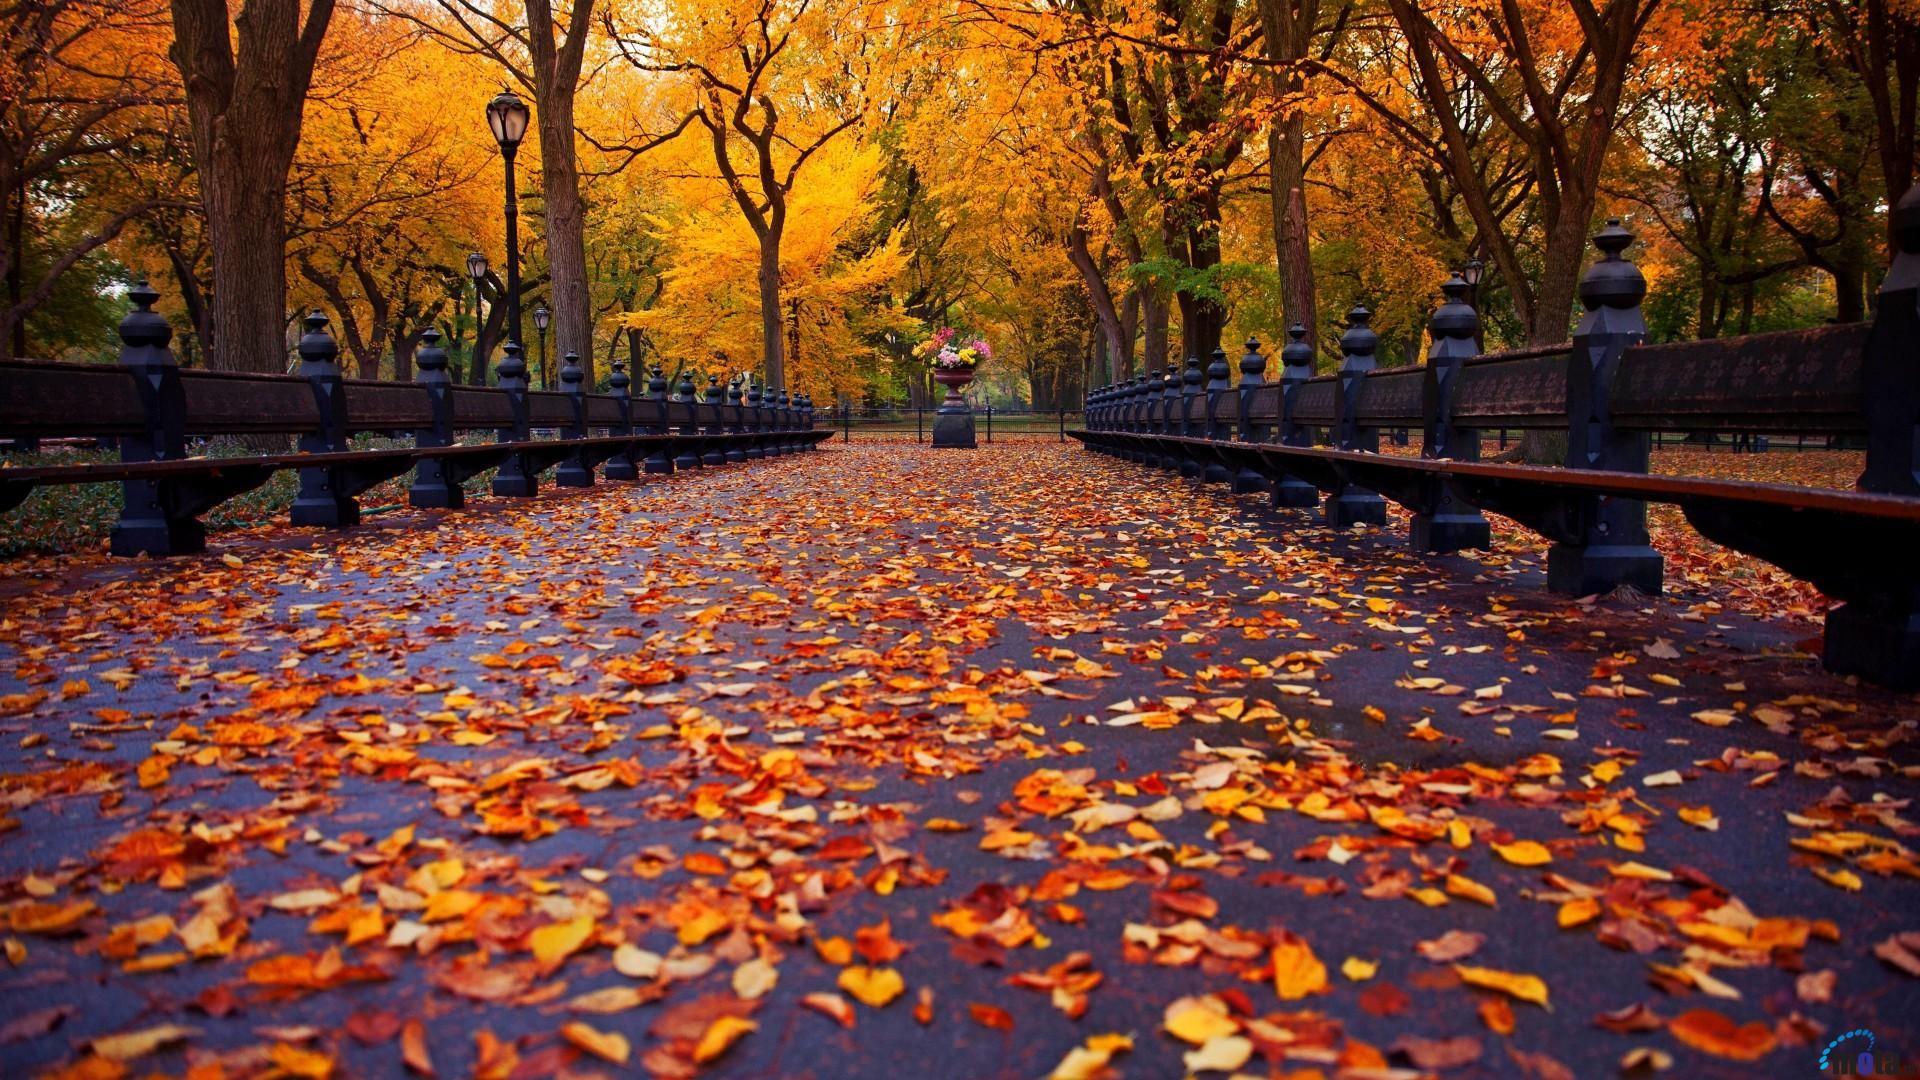 1920x1080, Fhdq Background » Background Id - New York Autumn - HD Wallpaper